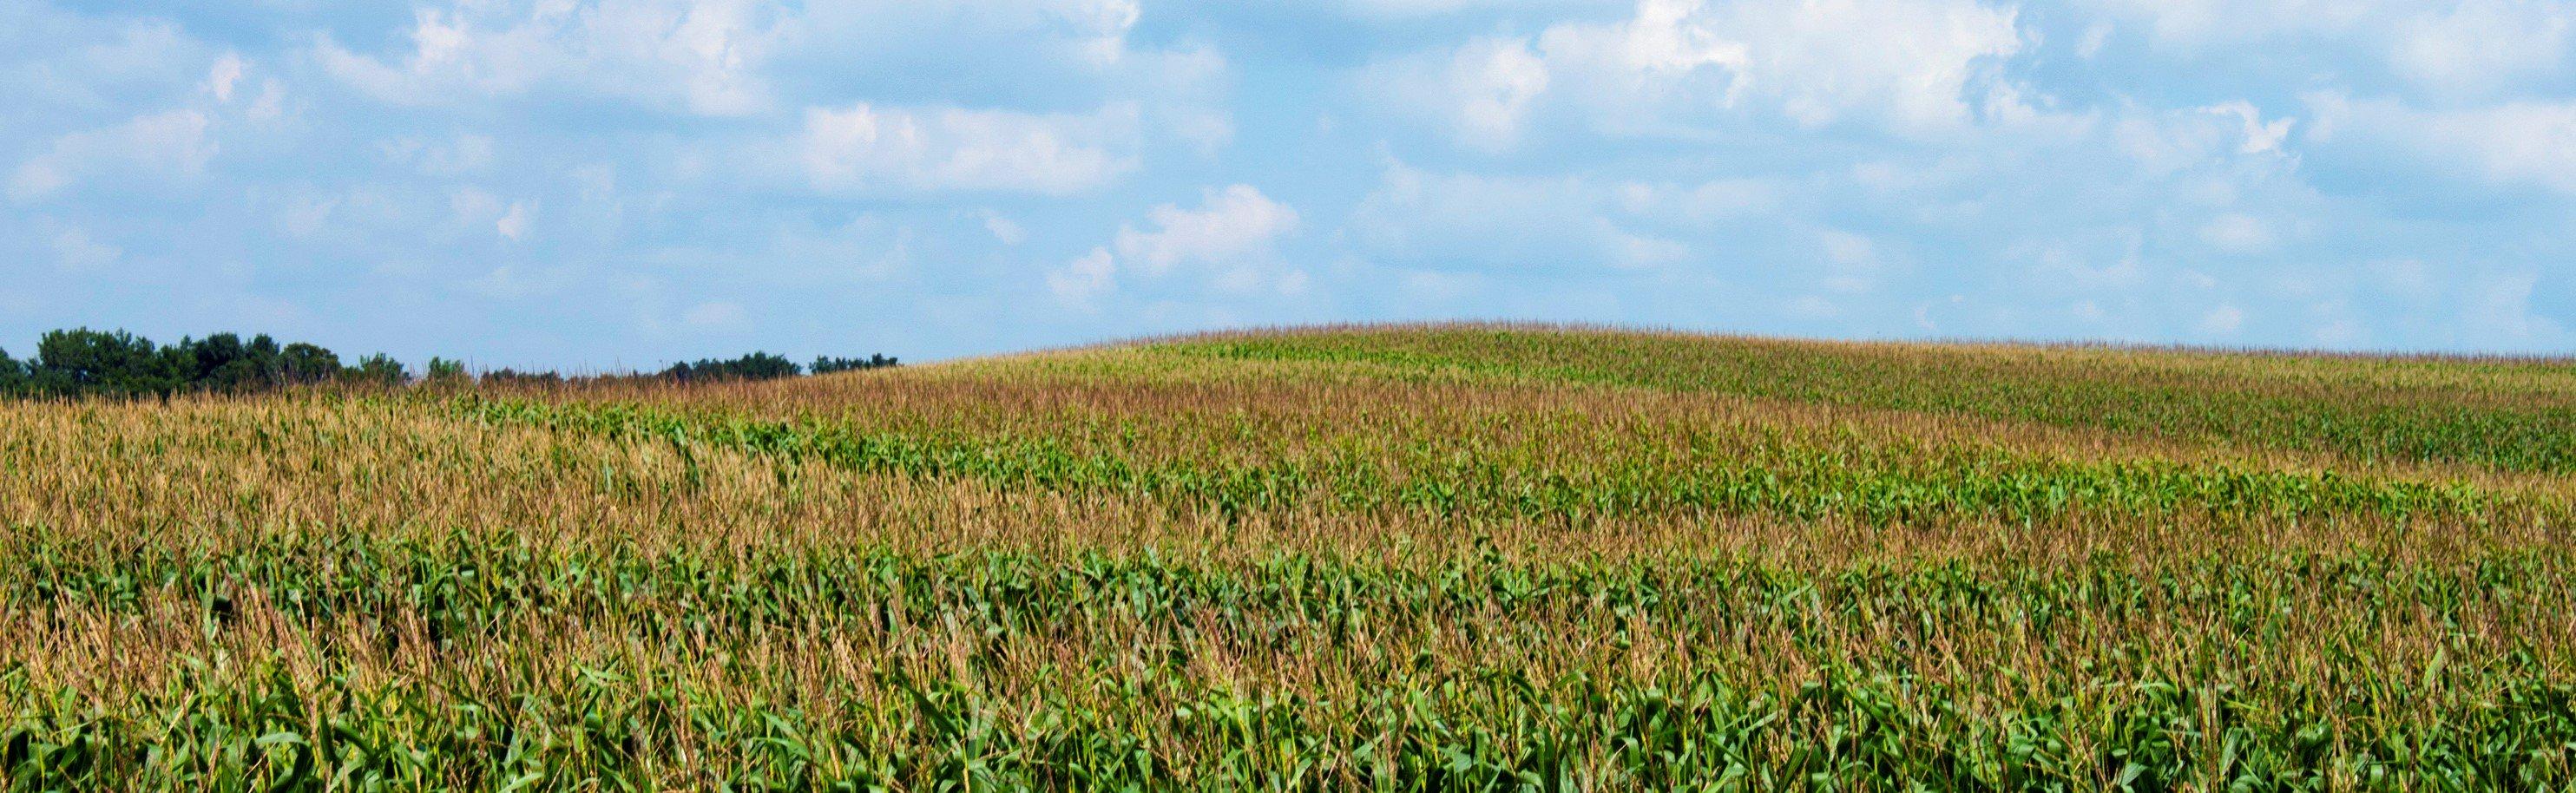 Cornfield July landscape